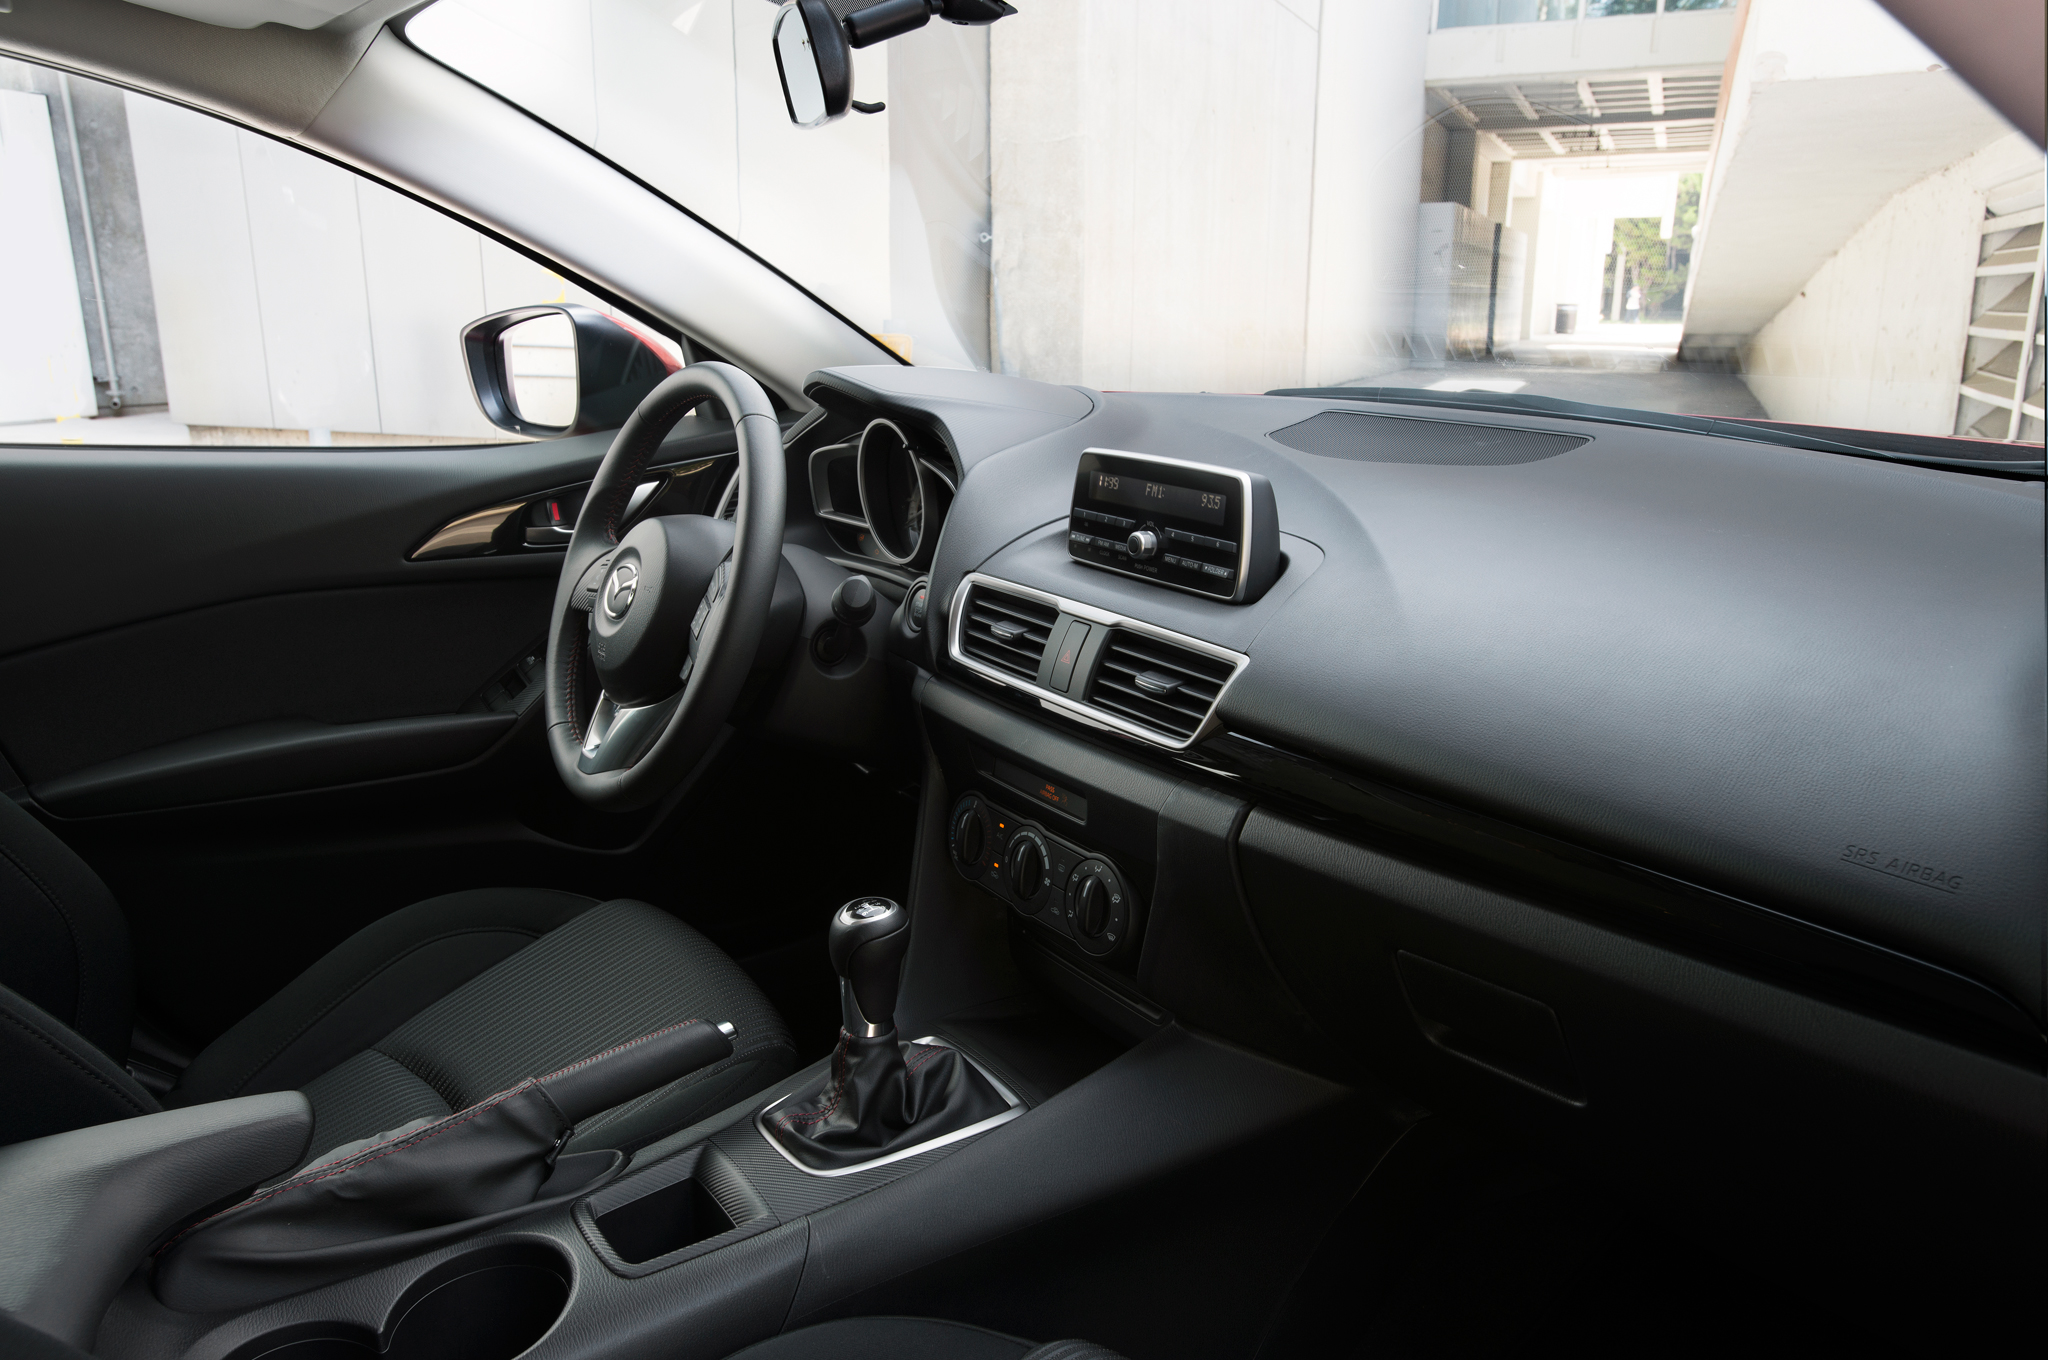 HQ 2014 Mazda 3 Wallpapers | File 1344.67Kb